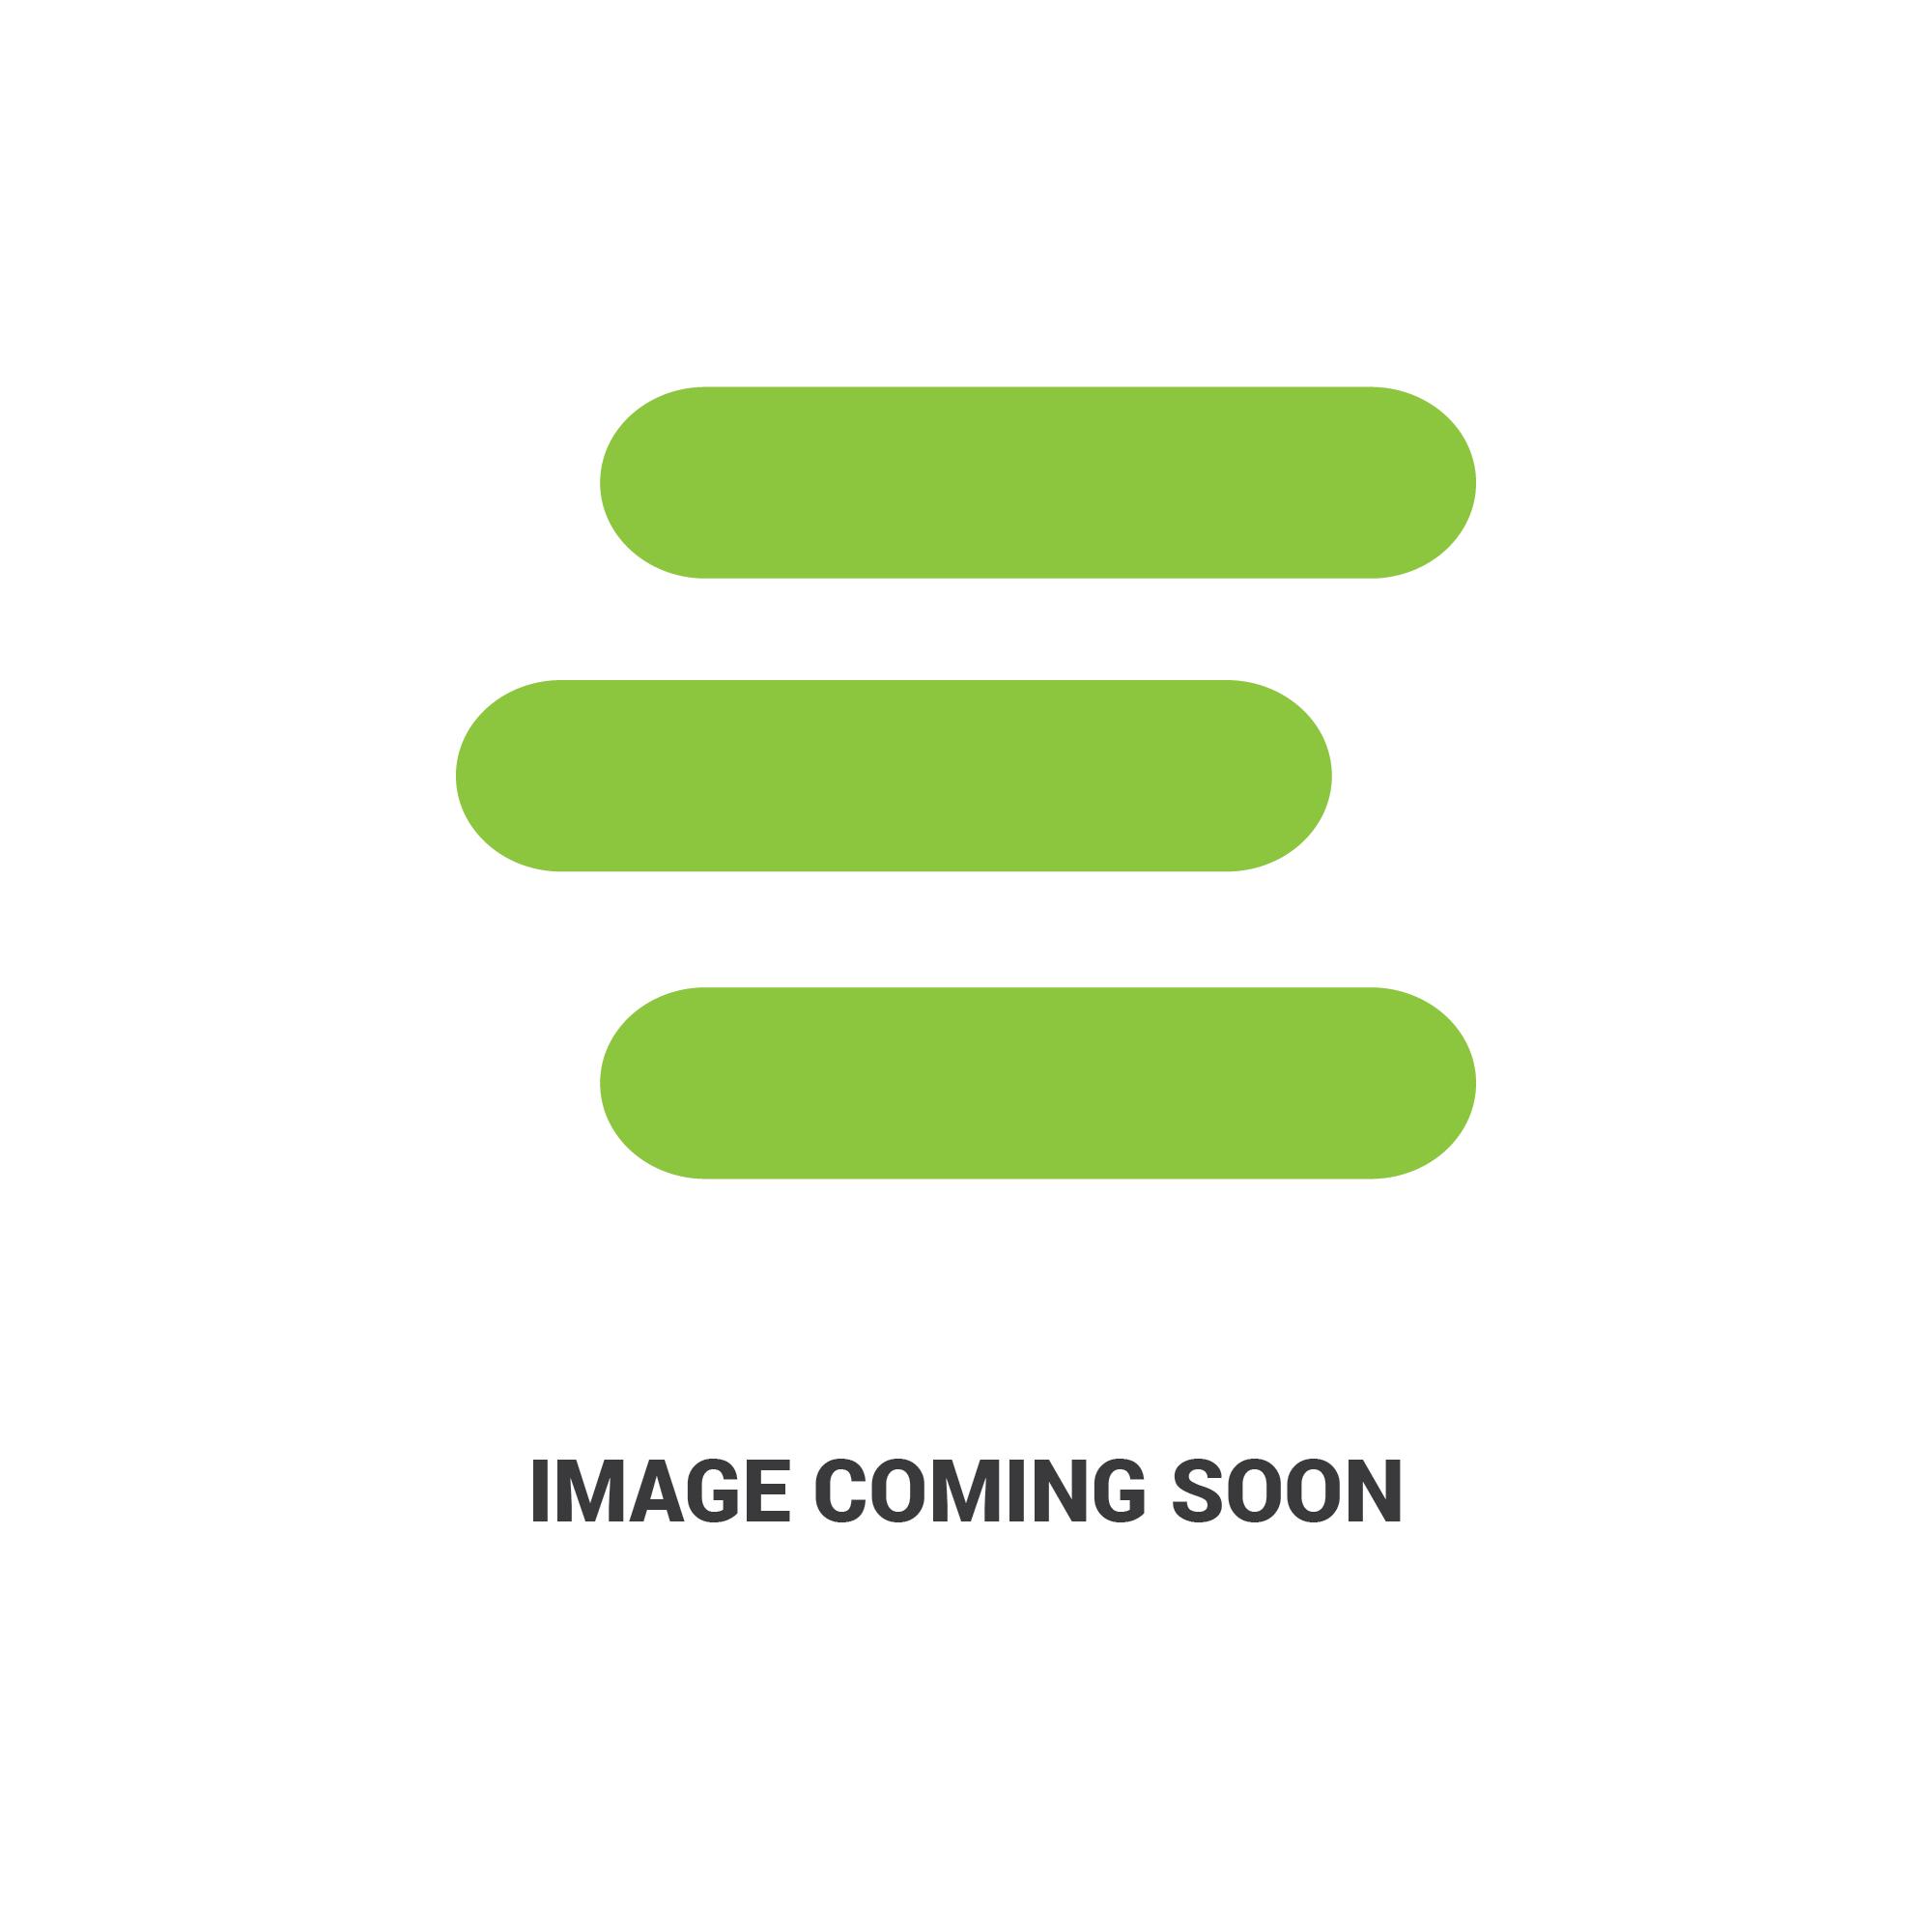 E-53066-0226-MAedit 2.jpg